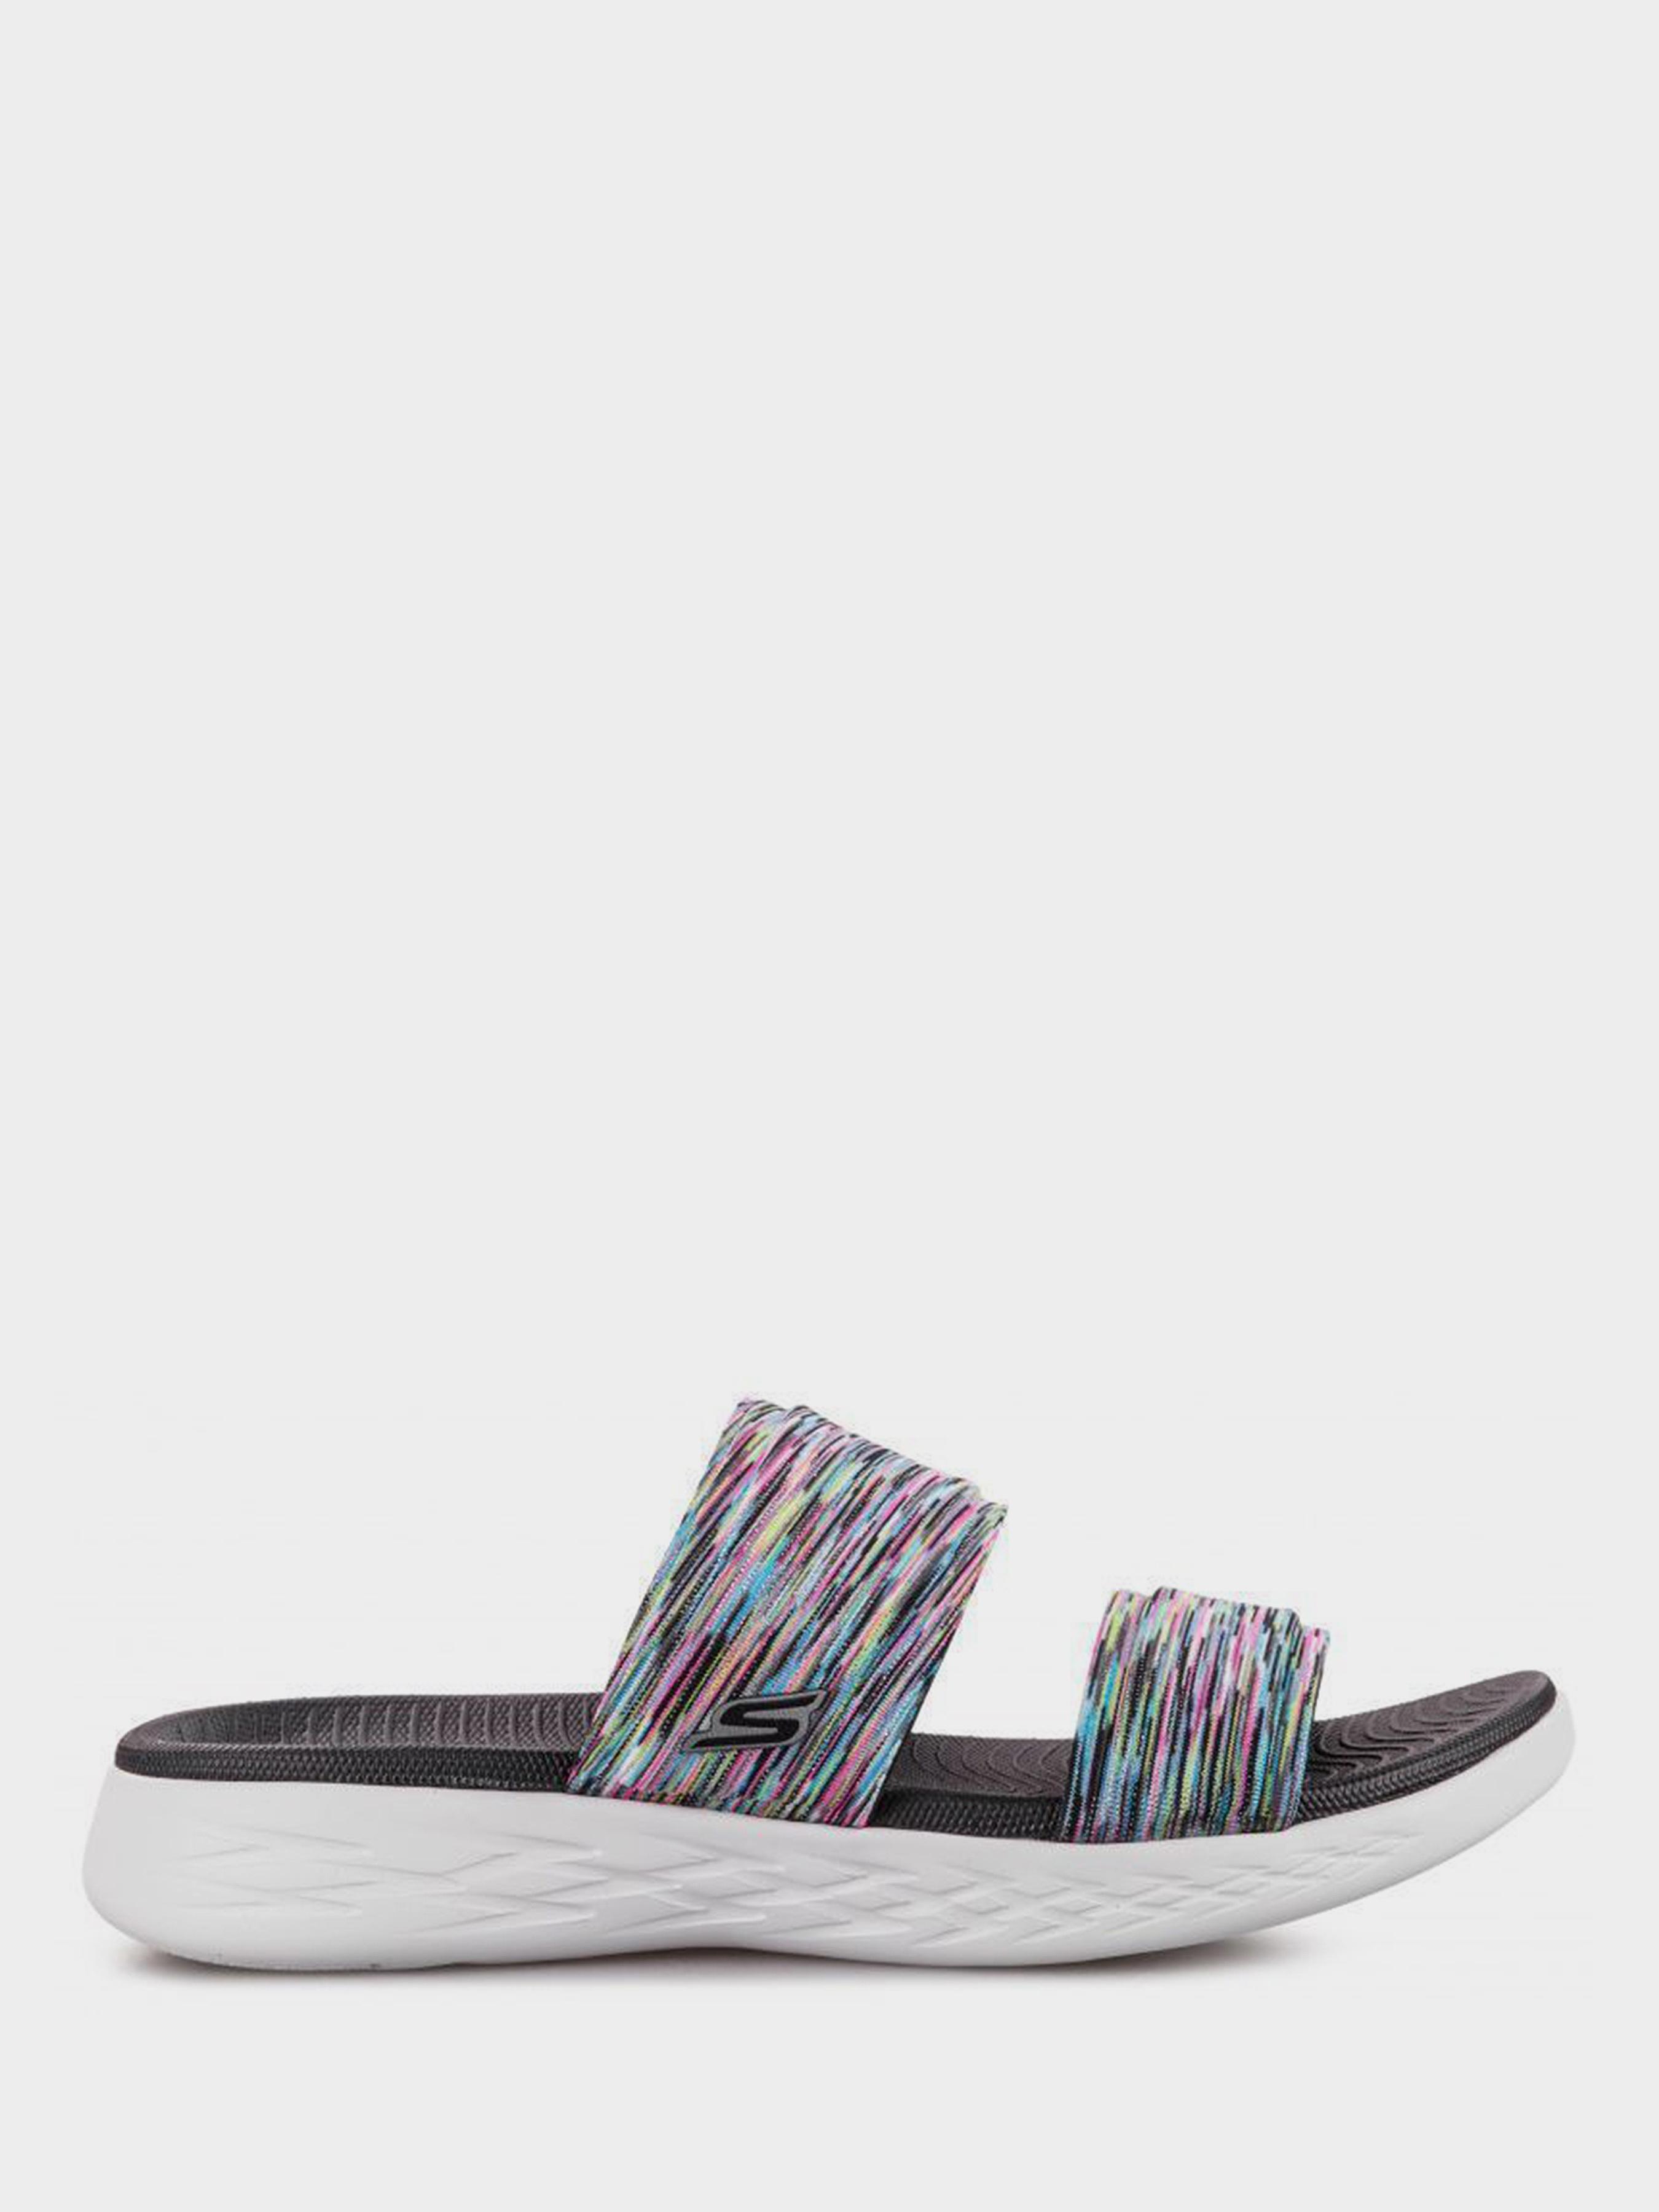 Шлёпанцы для женщин Skechers KW4775 размеры обуви, 2017